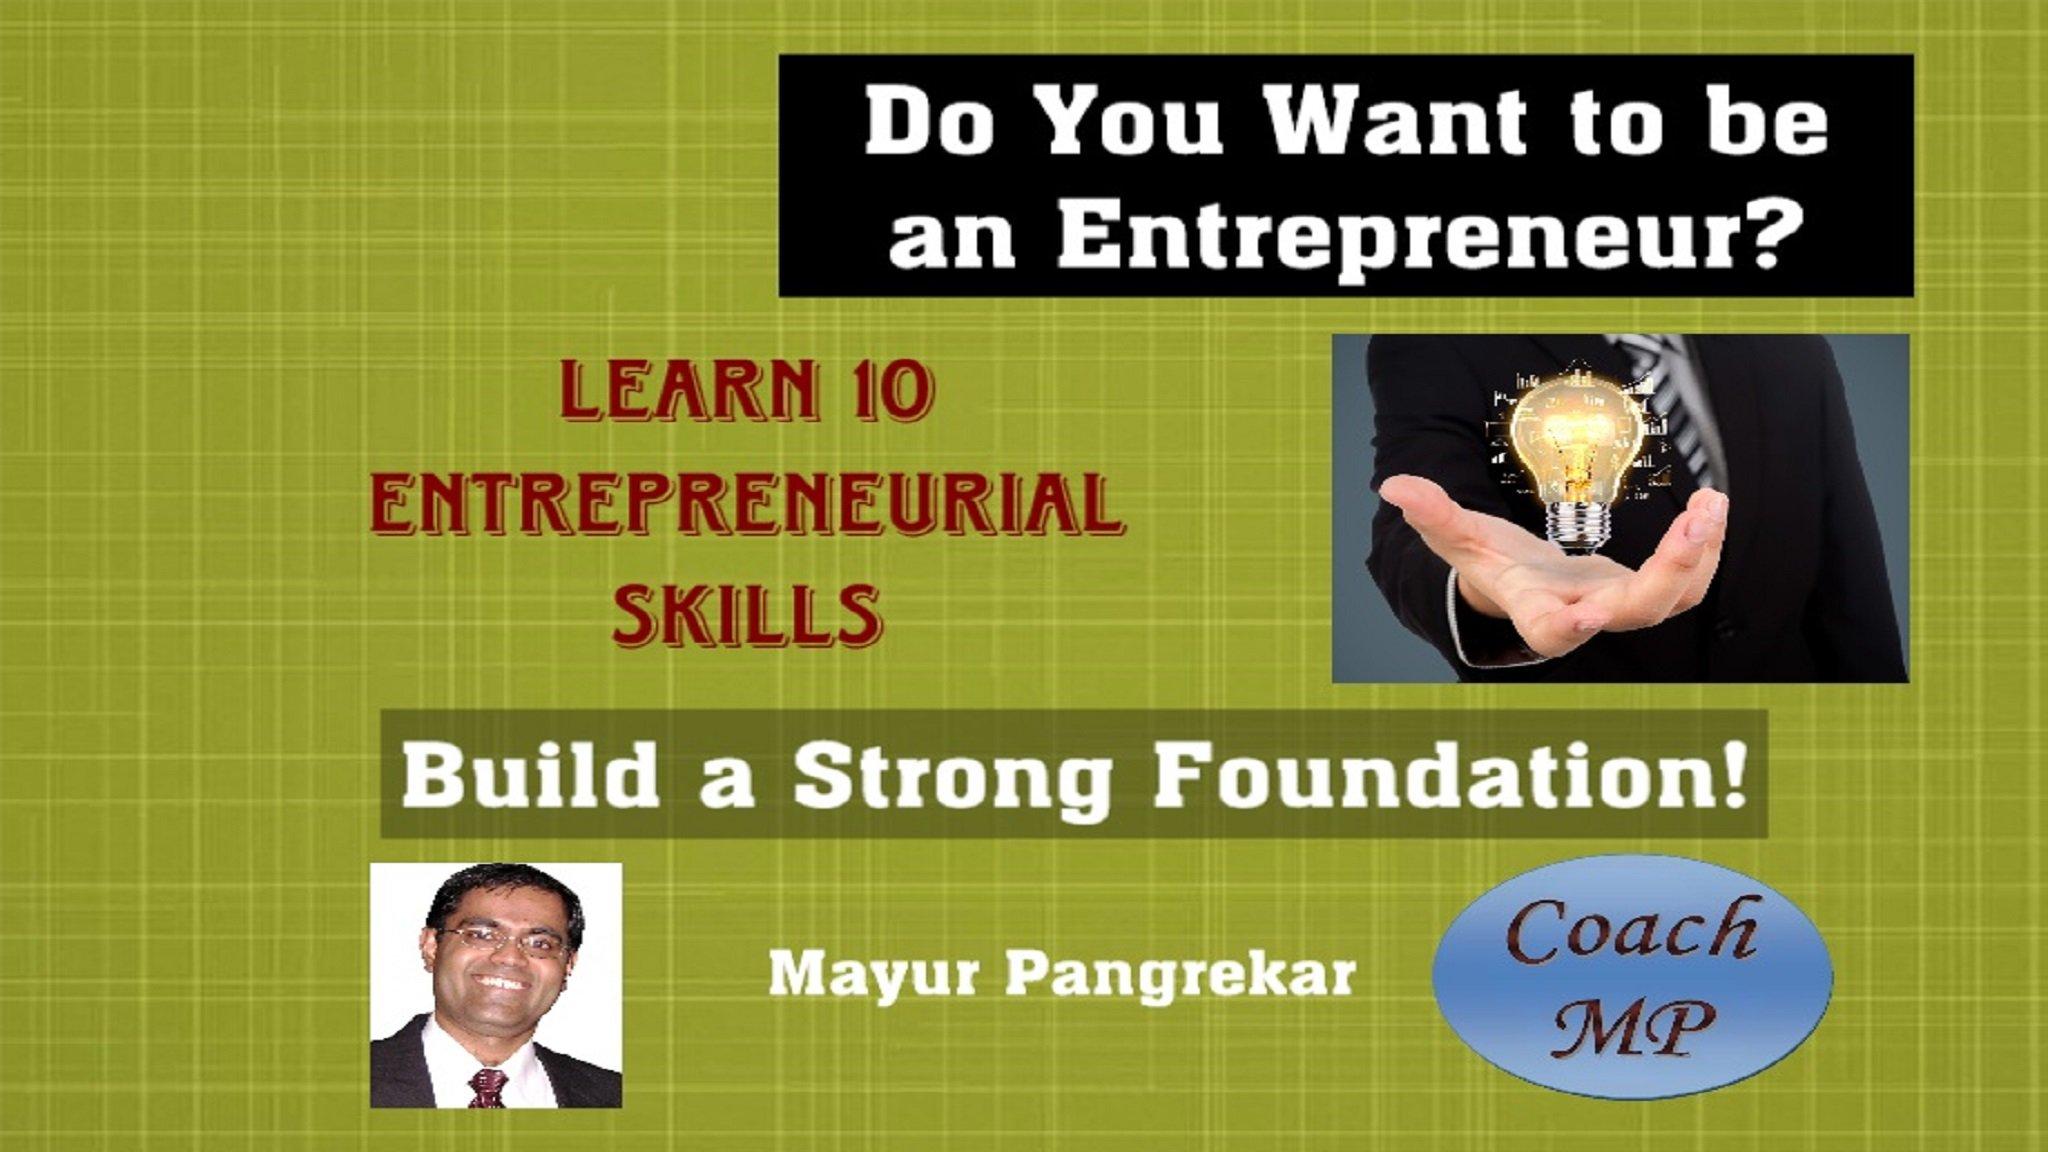 Learn 10 entrepreneurial skills fast